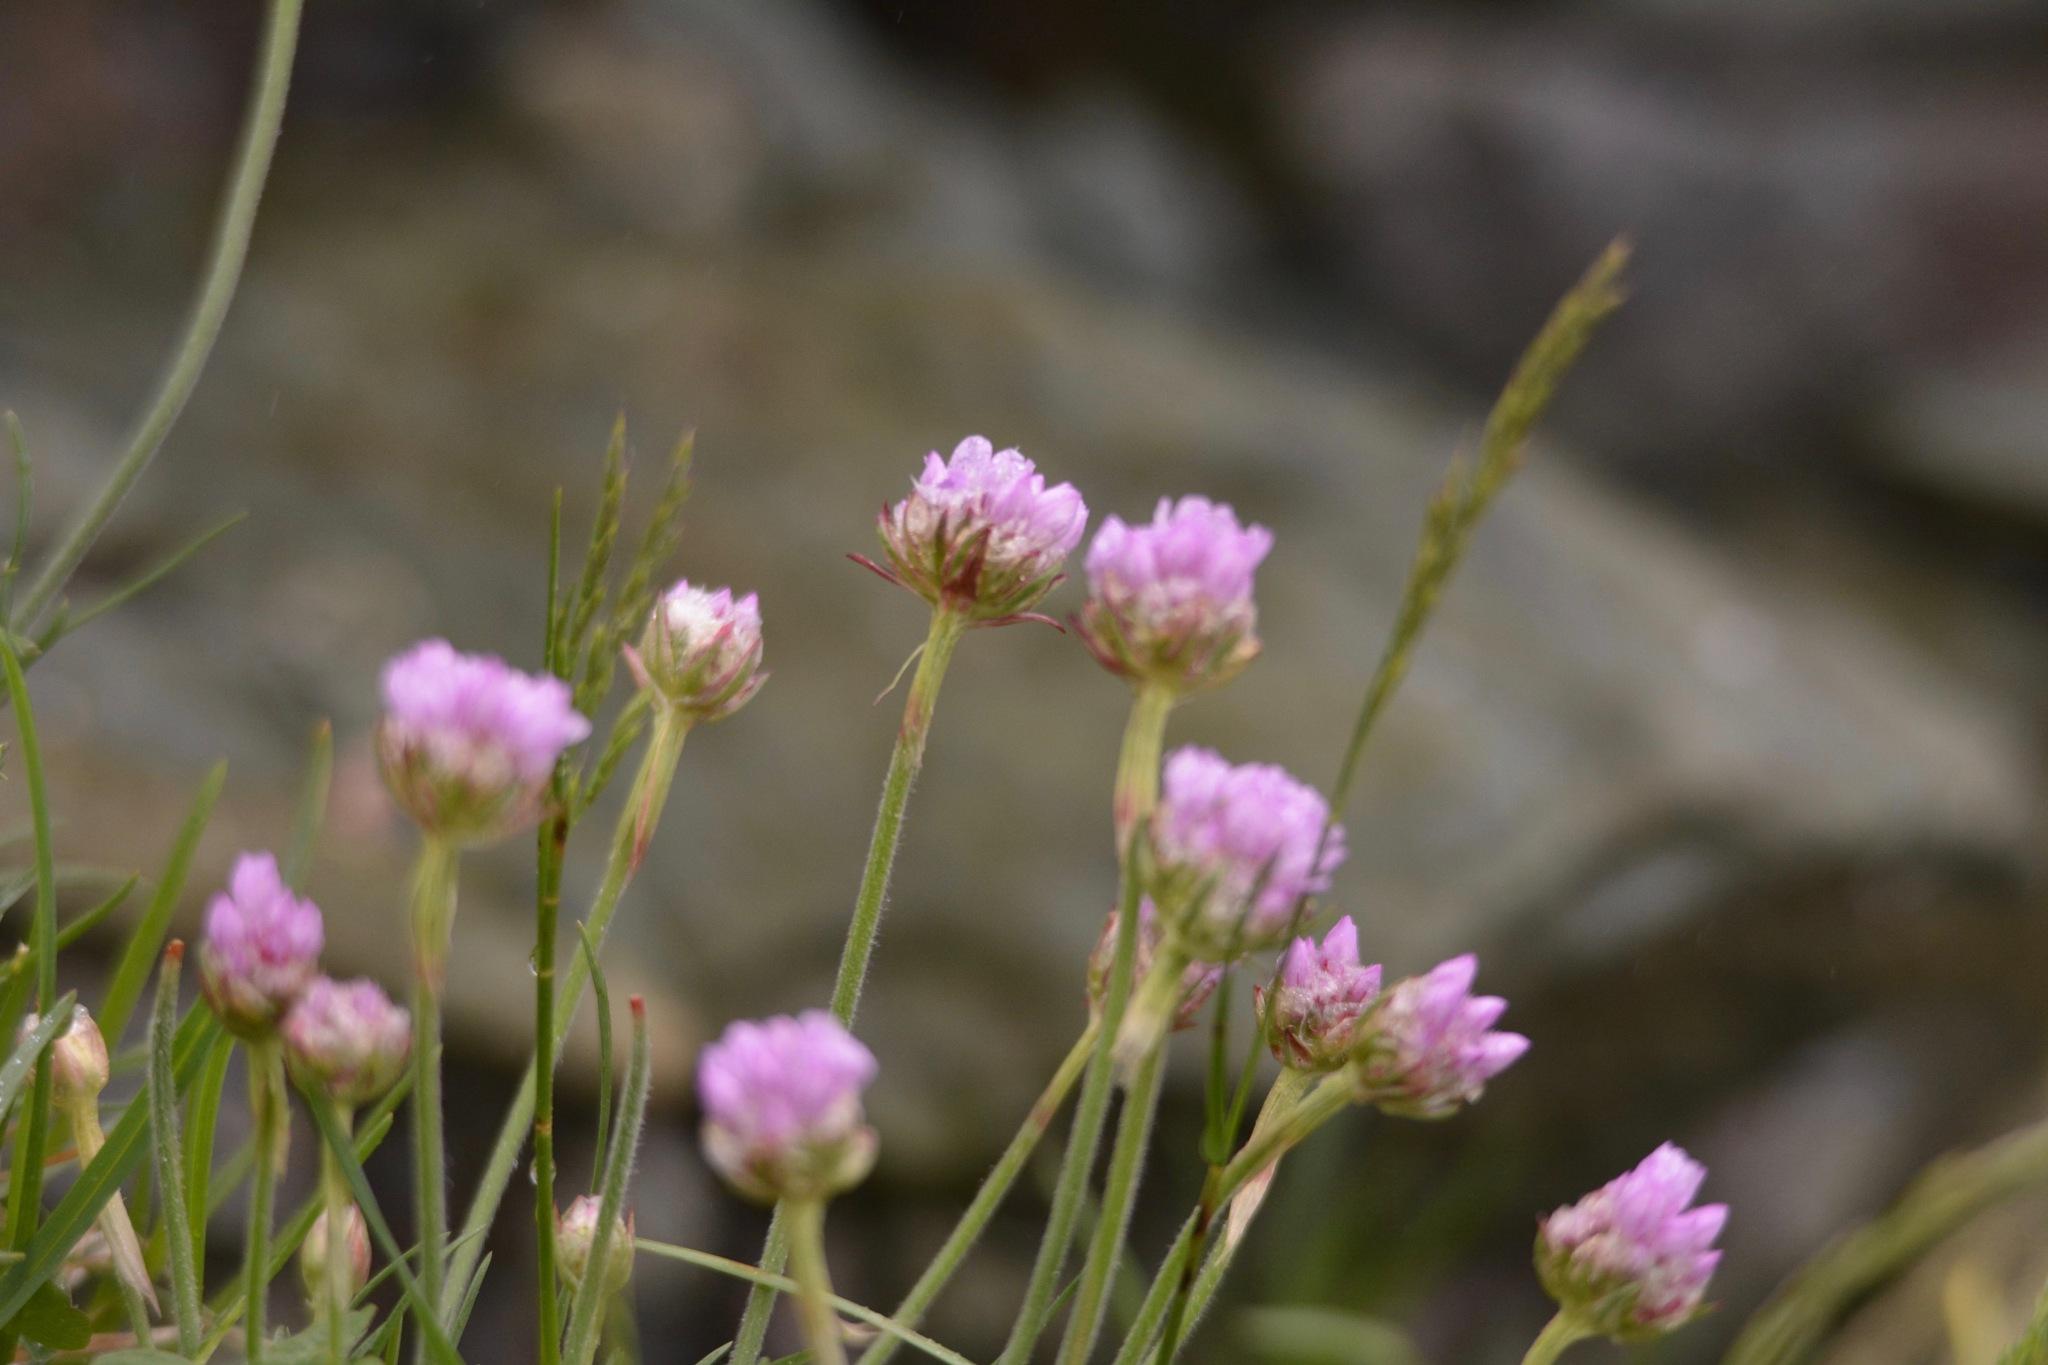 Heather in bloom 1.001 by Lars-Toralf Utnes Storstrand